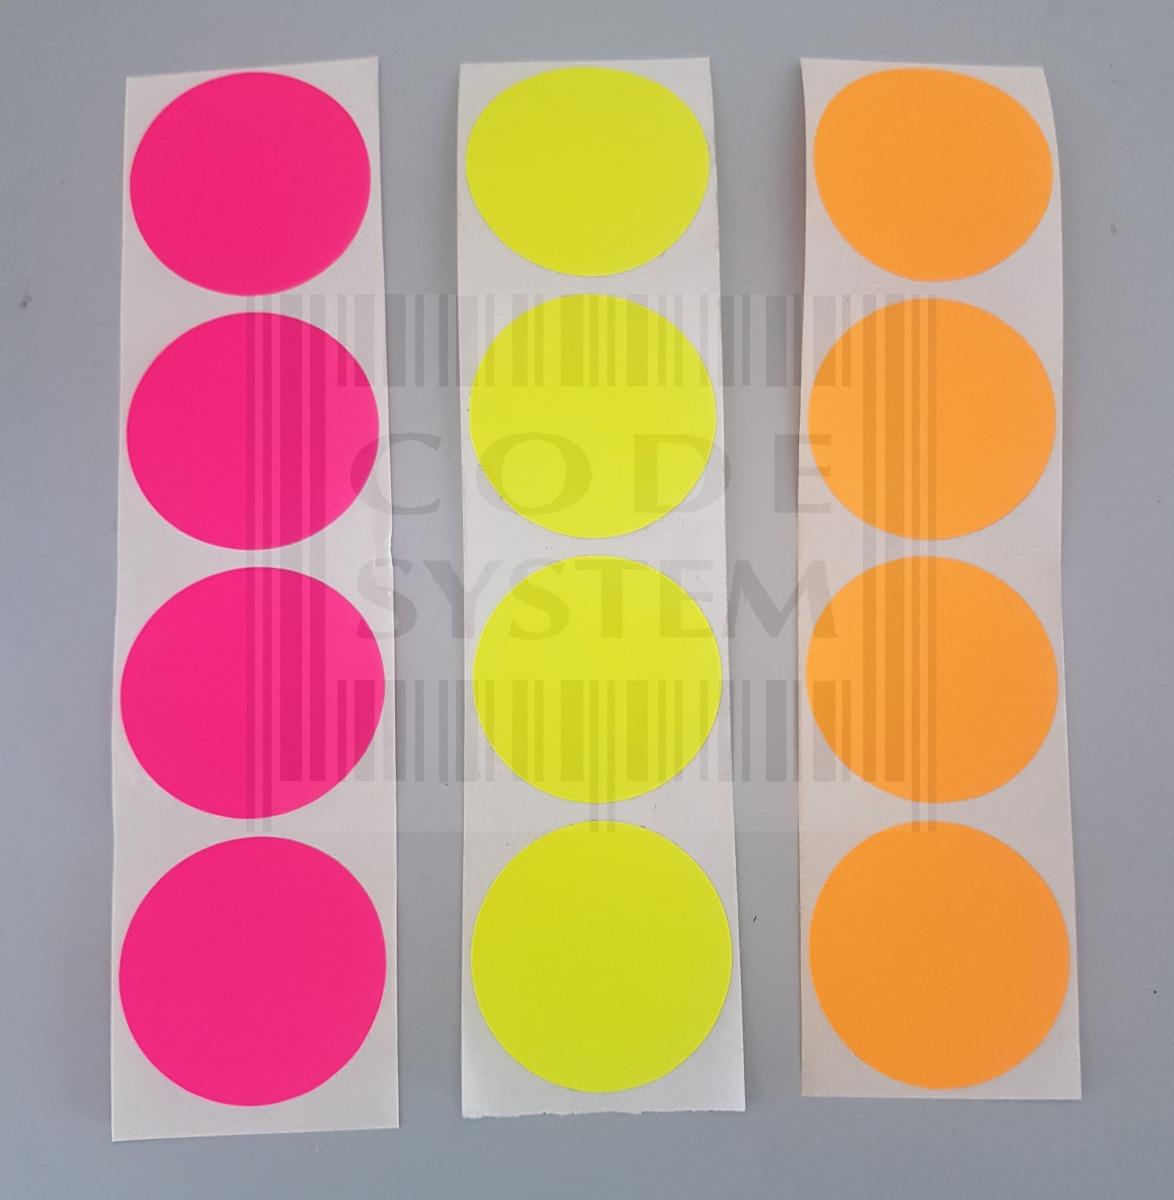 100 Etiquetas Redondas Fluor Impresas Autoadhesivas De 50 Mm